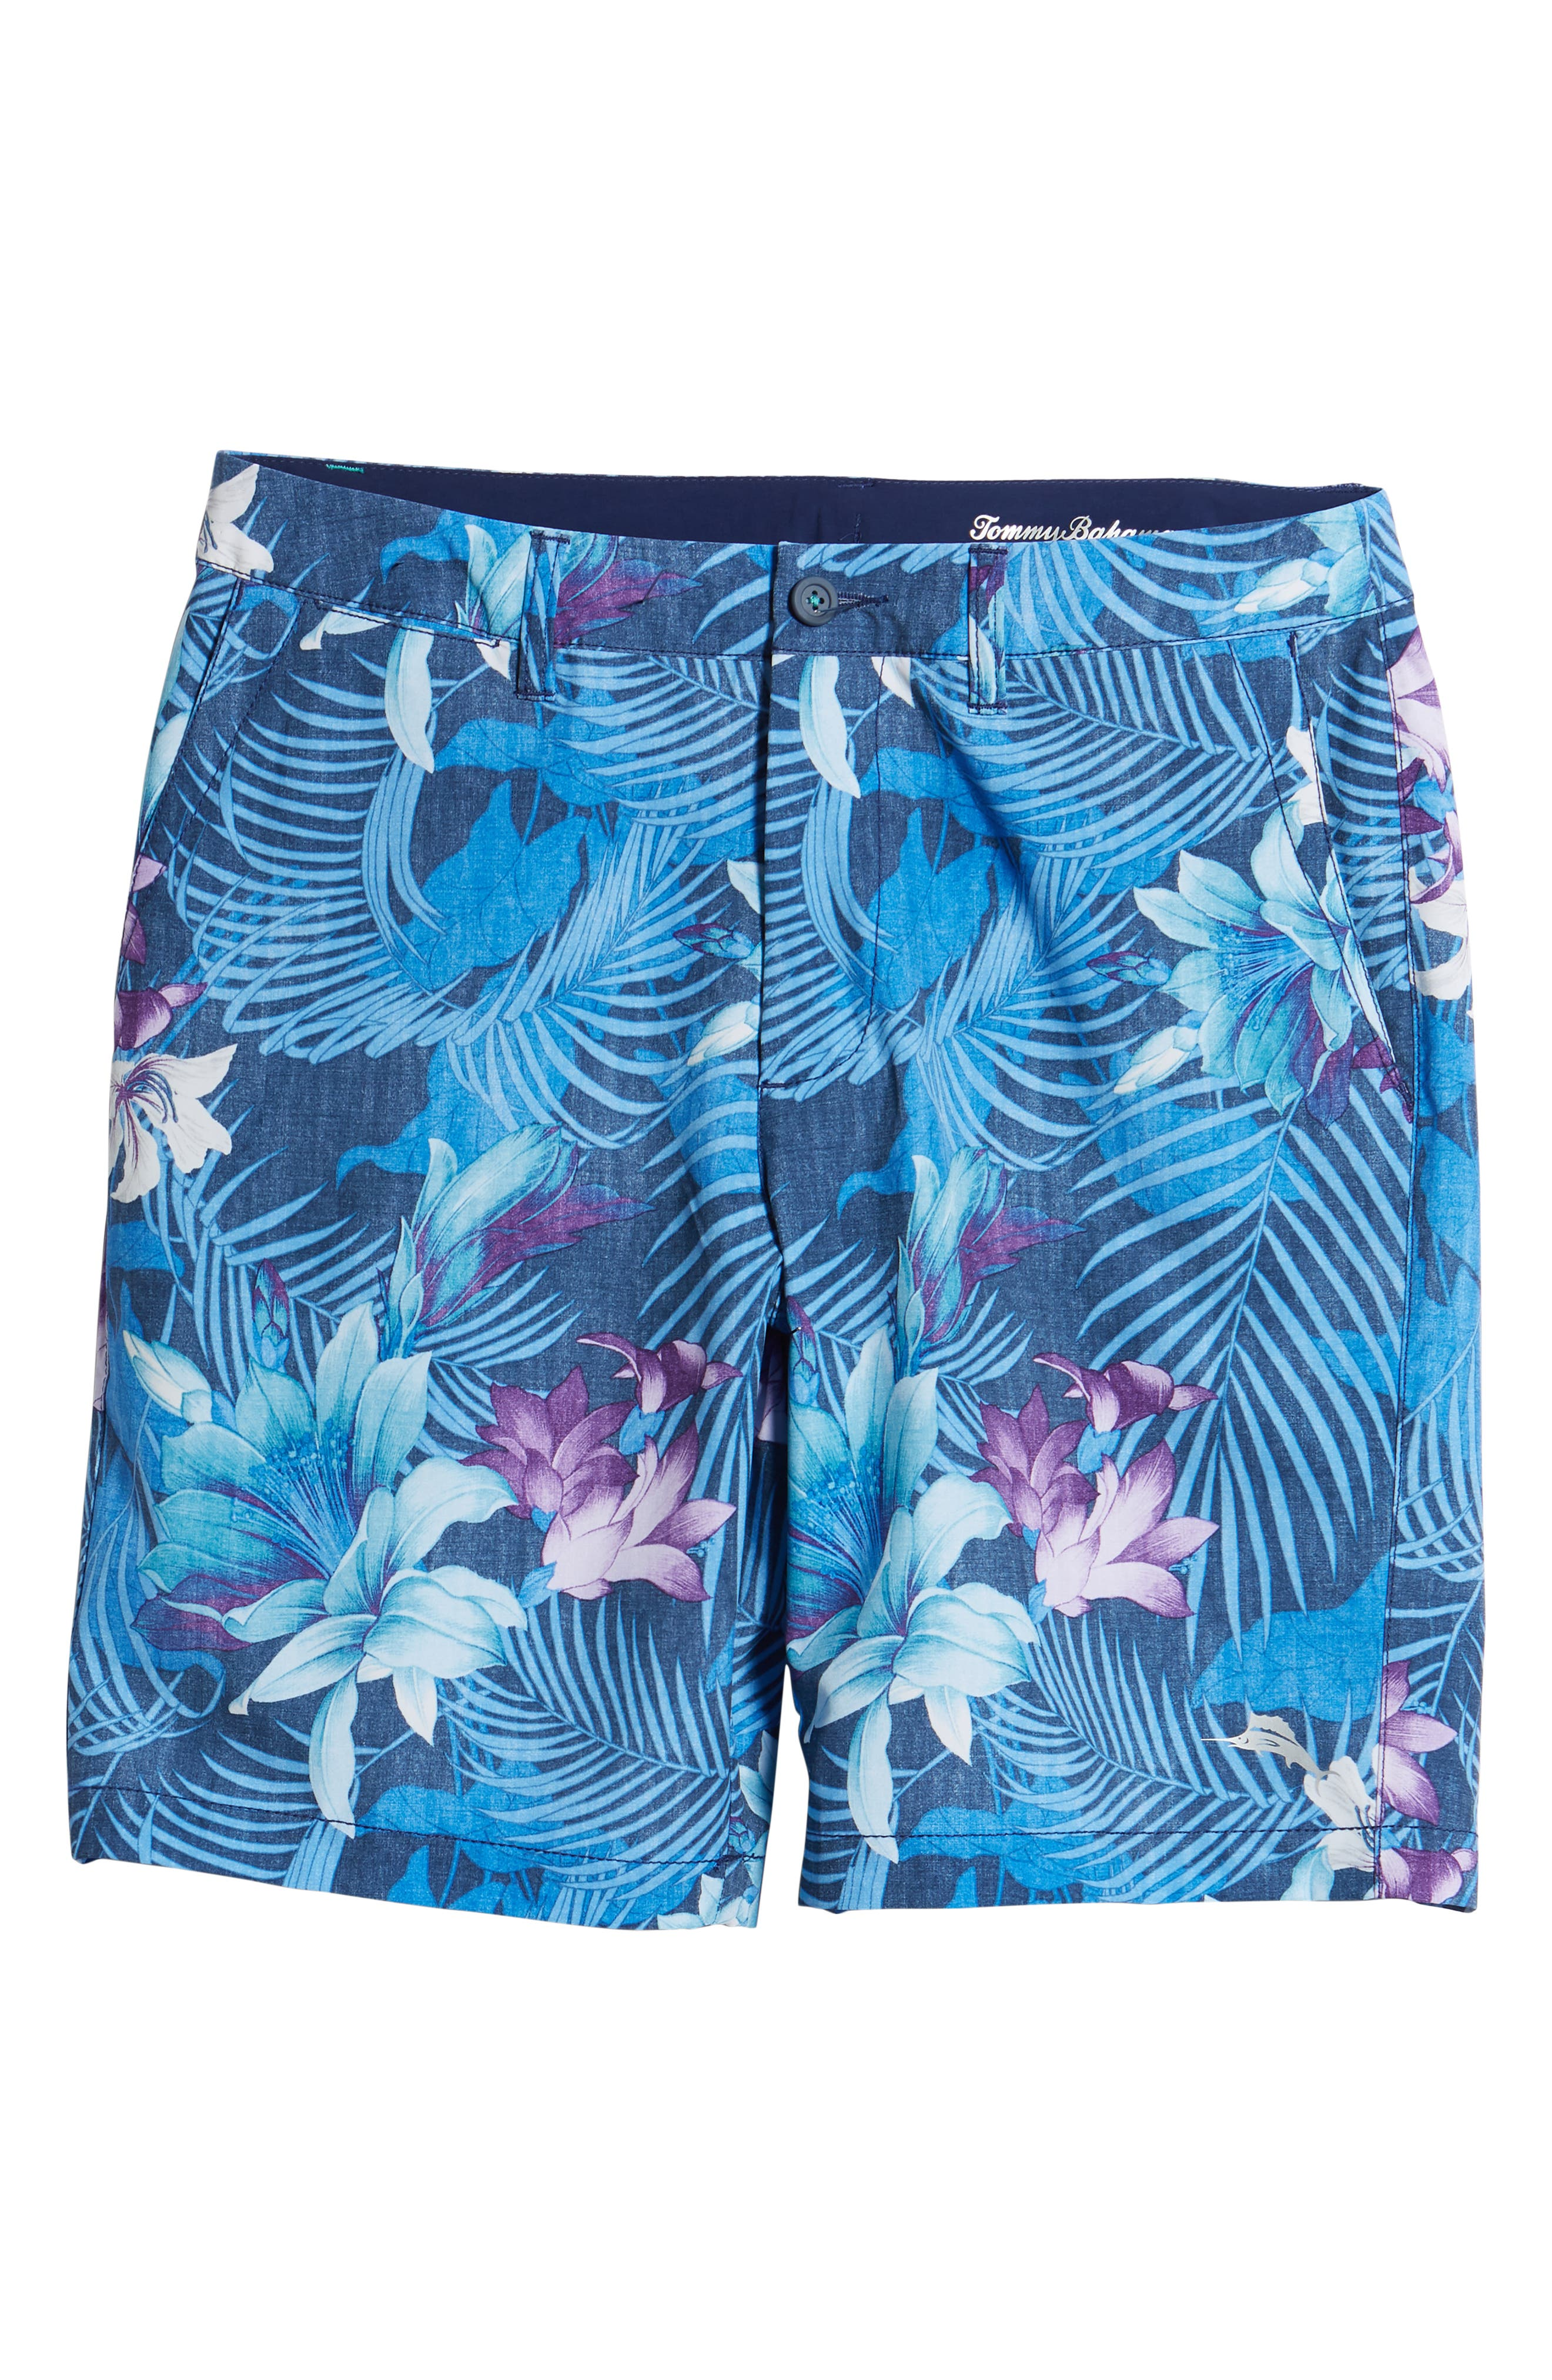 Cayman Laredo Blooms Board Shorts,                             Alternate thumbnail 6, color,                             Ocean Deep